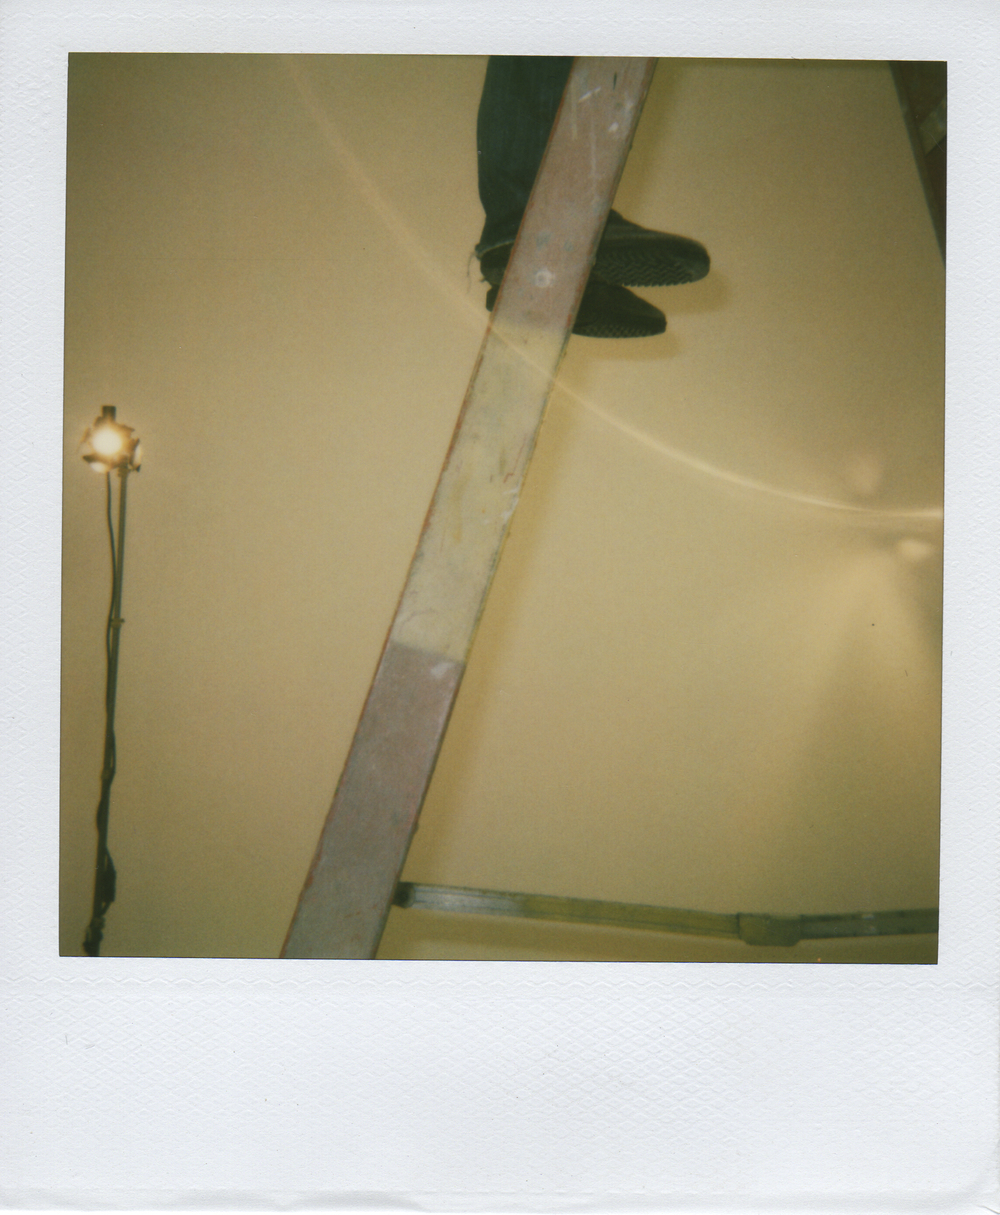 jlaurence-polaroid-037.jpg